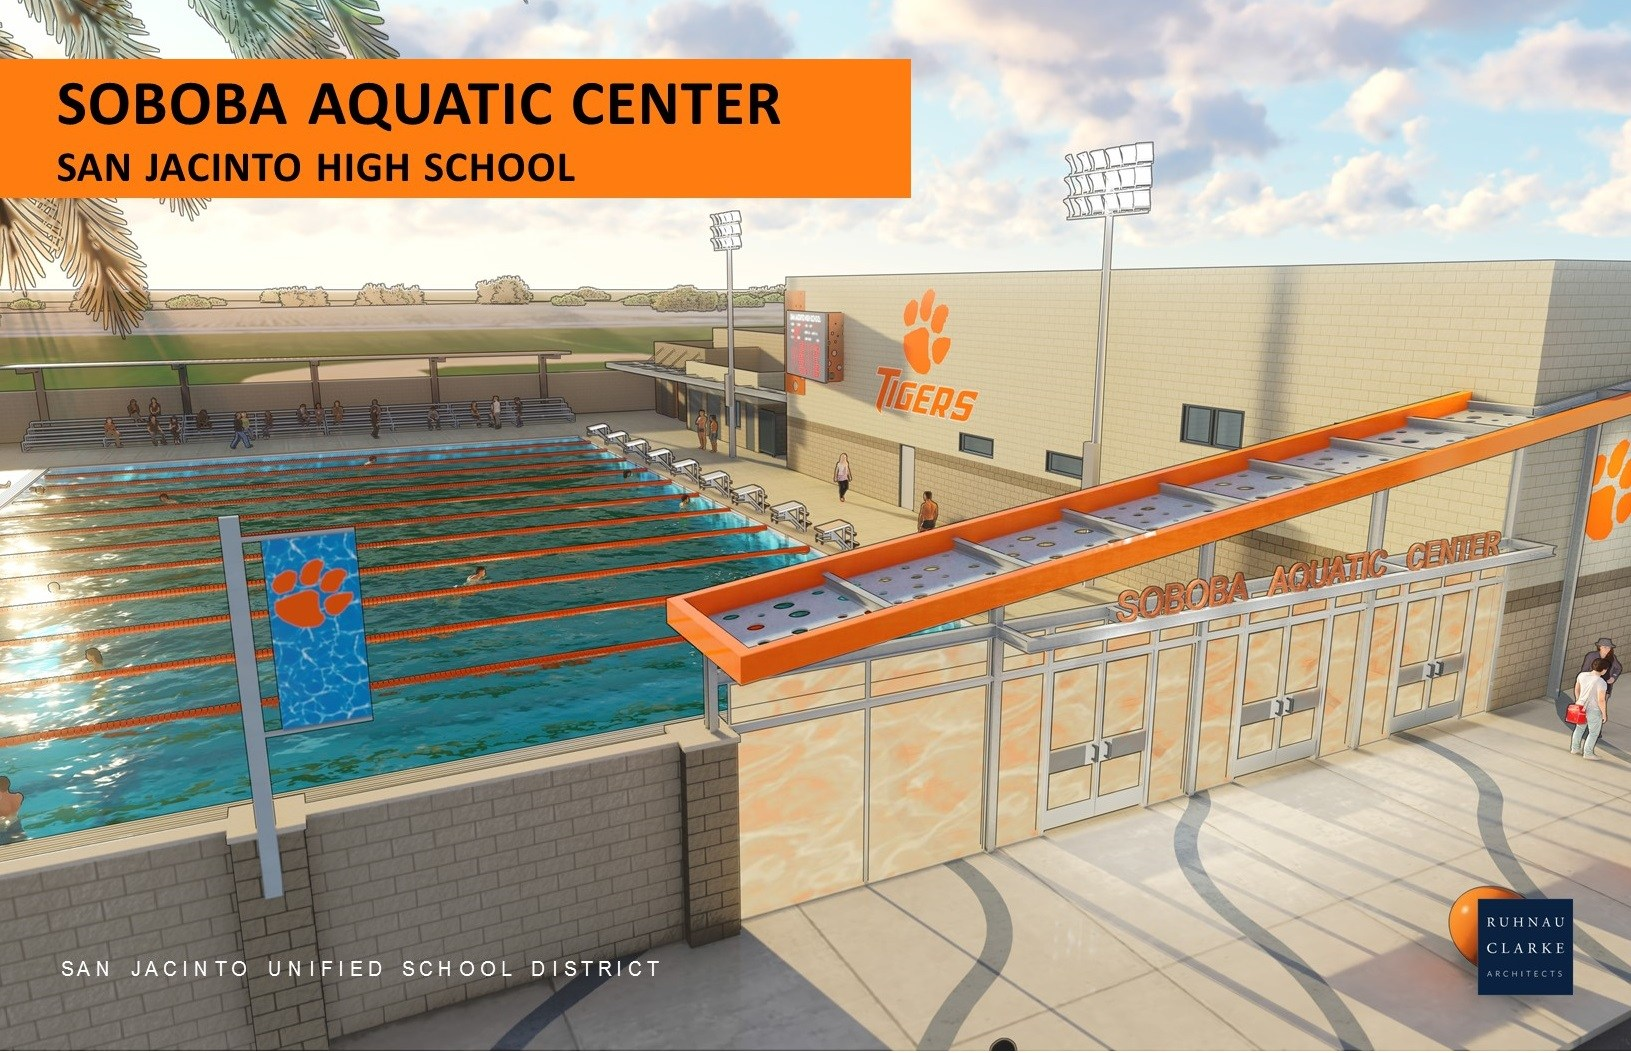 Conceptual drawings of Soboba Aquatic Center